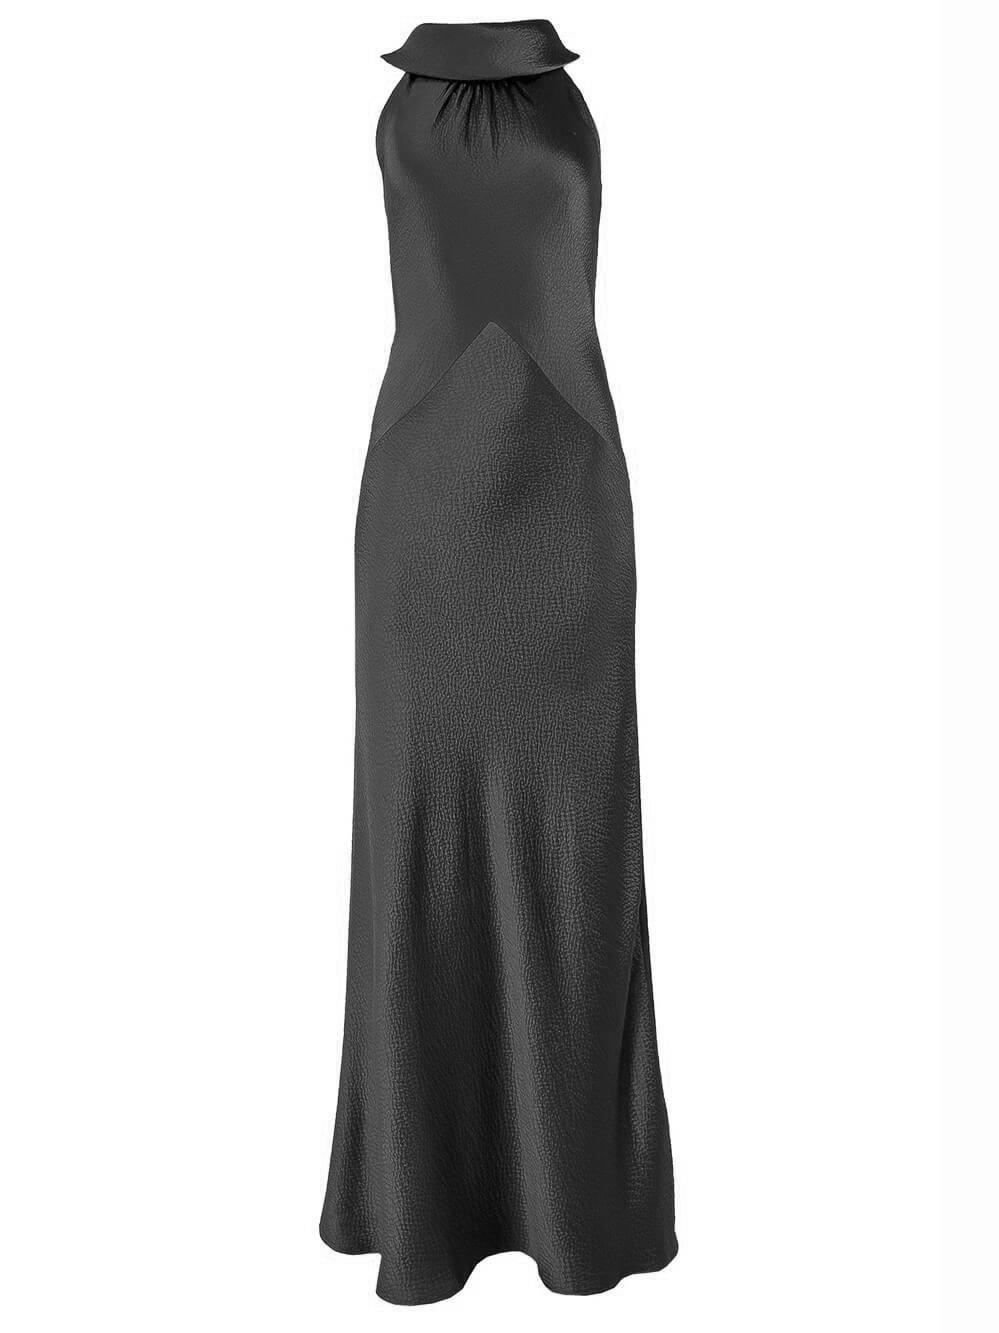 Hammered Satin Halter Gown Item # 1079